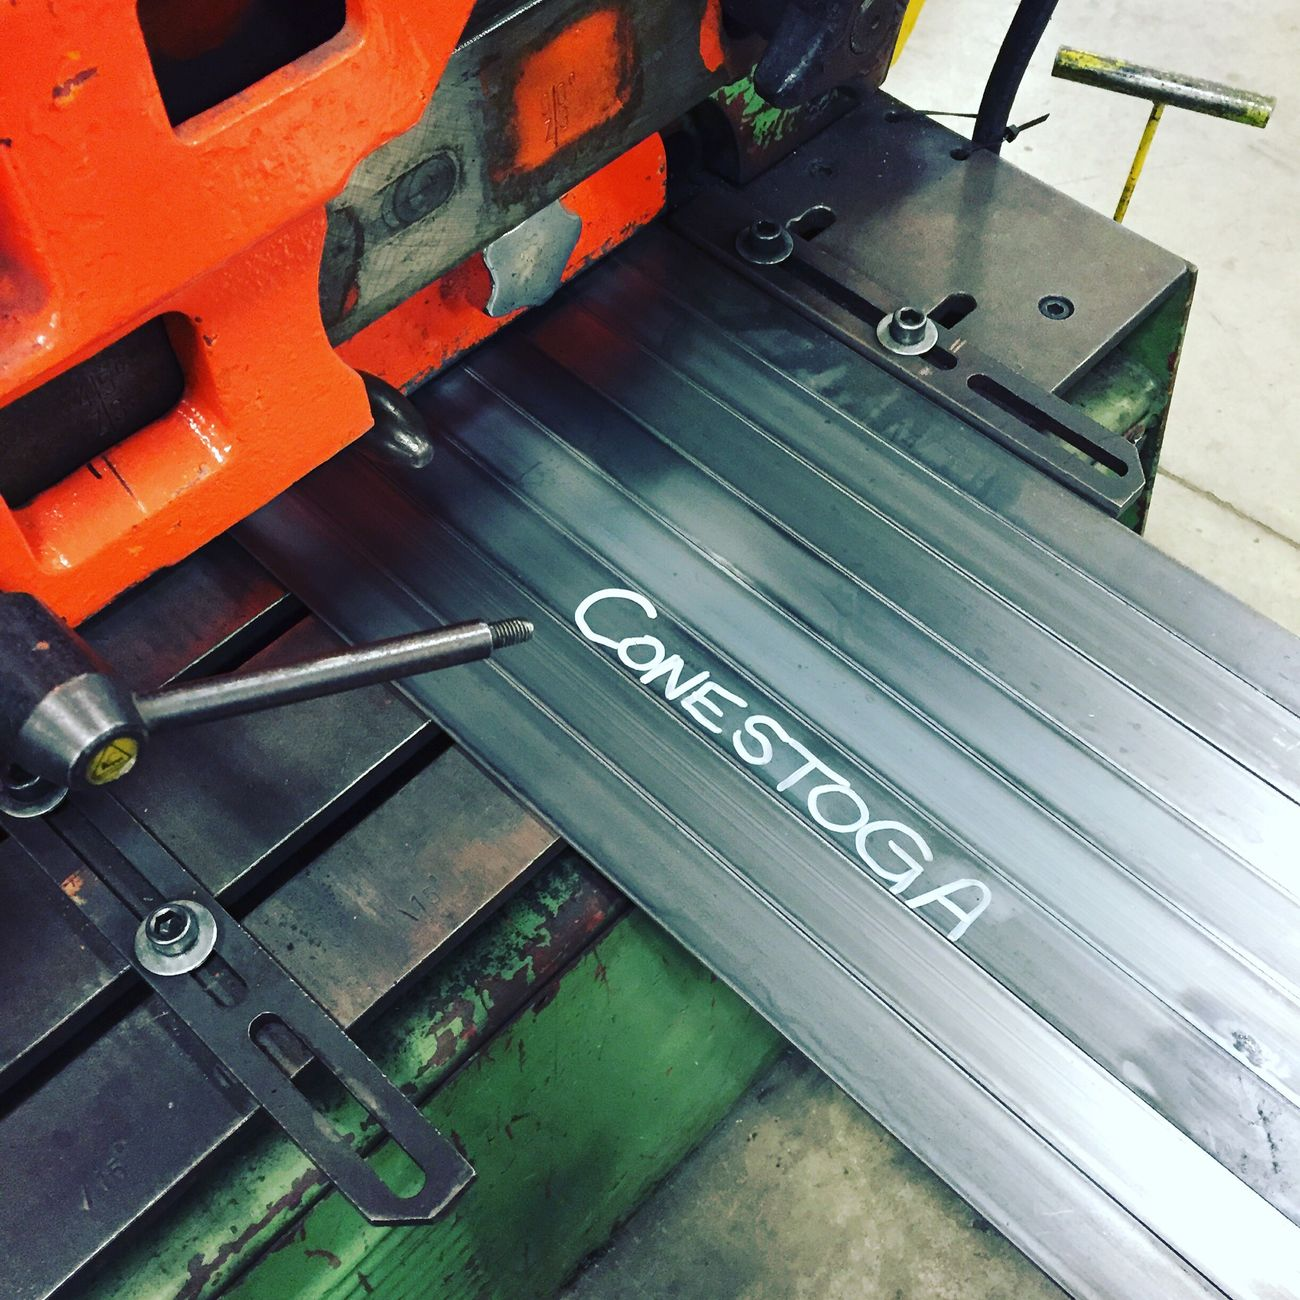 Cutting coupons Conestoga college style Summer Student Weld Shop Fab Shop Mild Steel Ten Gauge Conestoga College